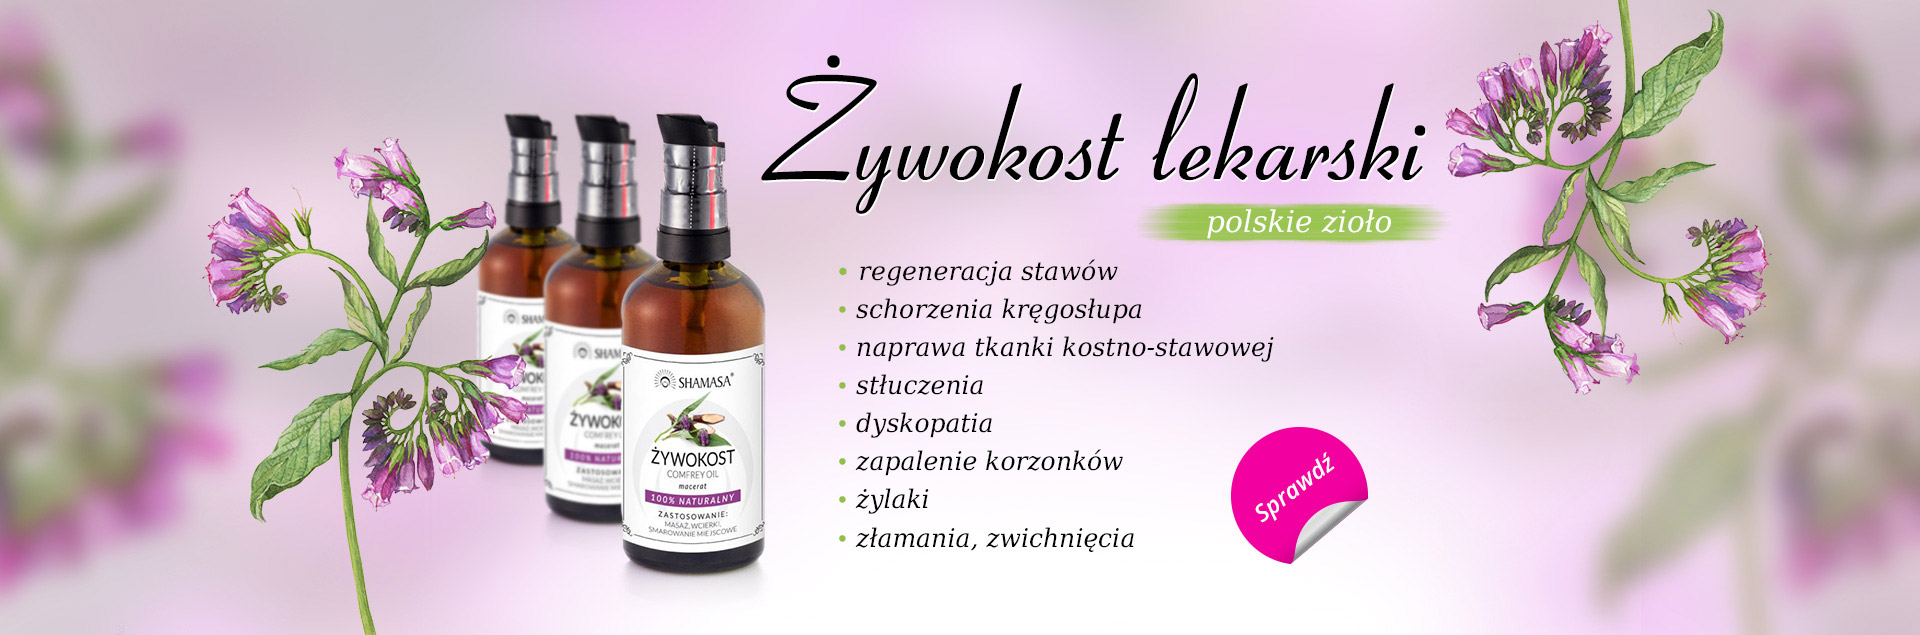 Comfrey - Polish herb